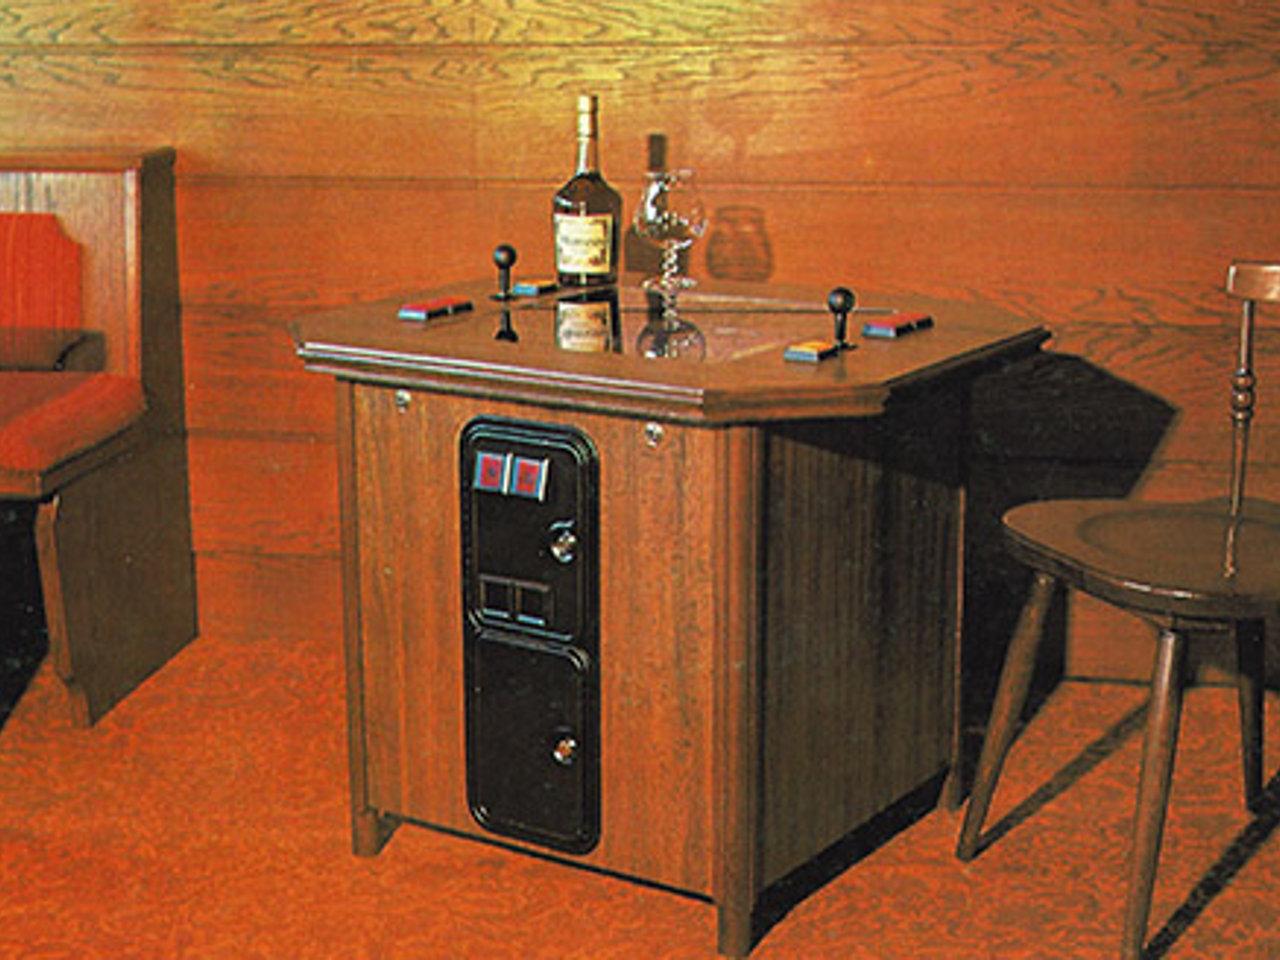 Ein Novomatic star-line Spielautomat. (Bild: Privatarchiv)